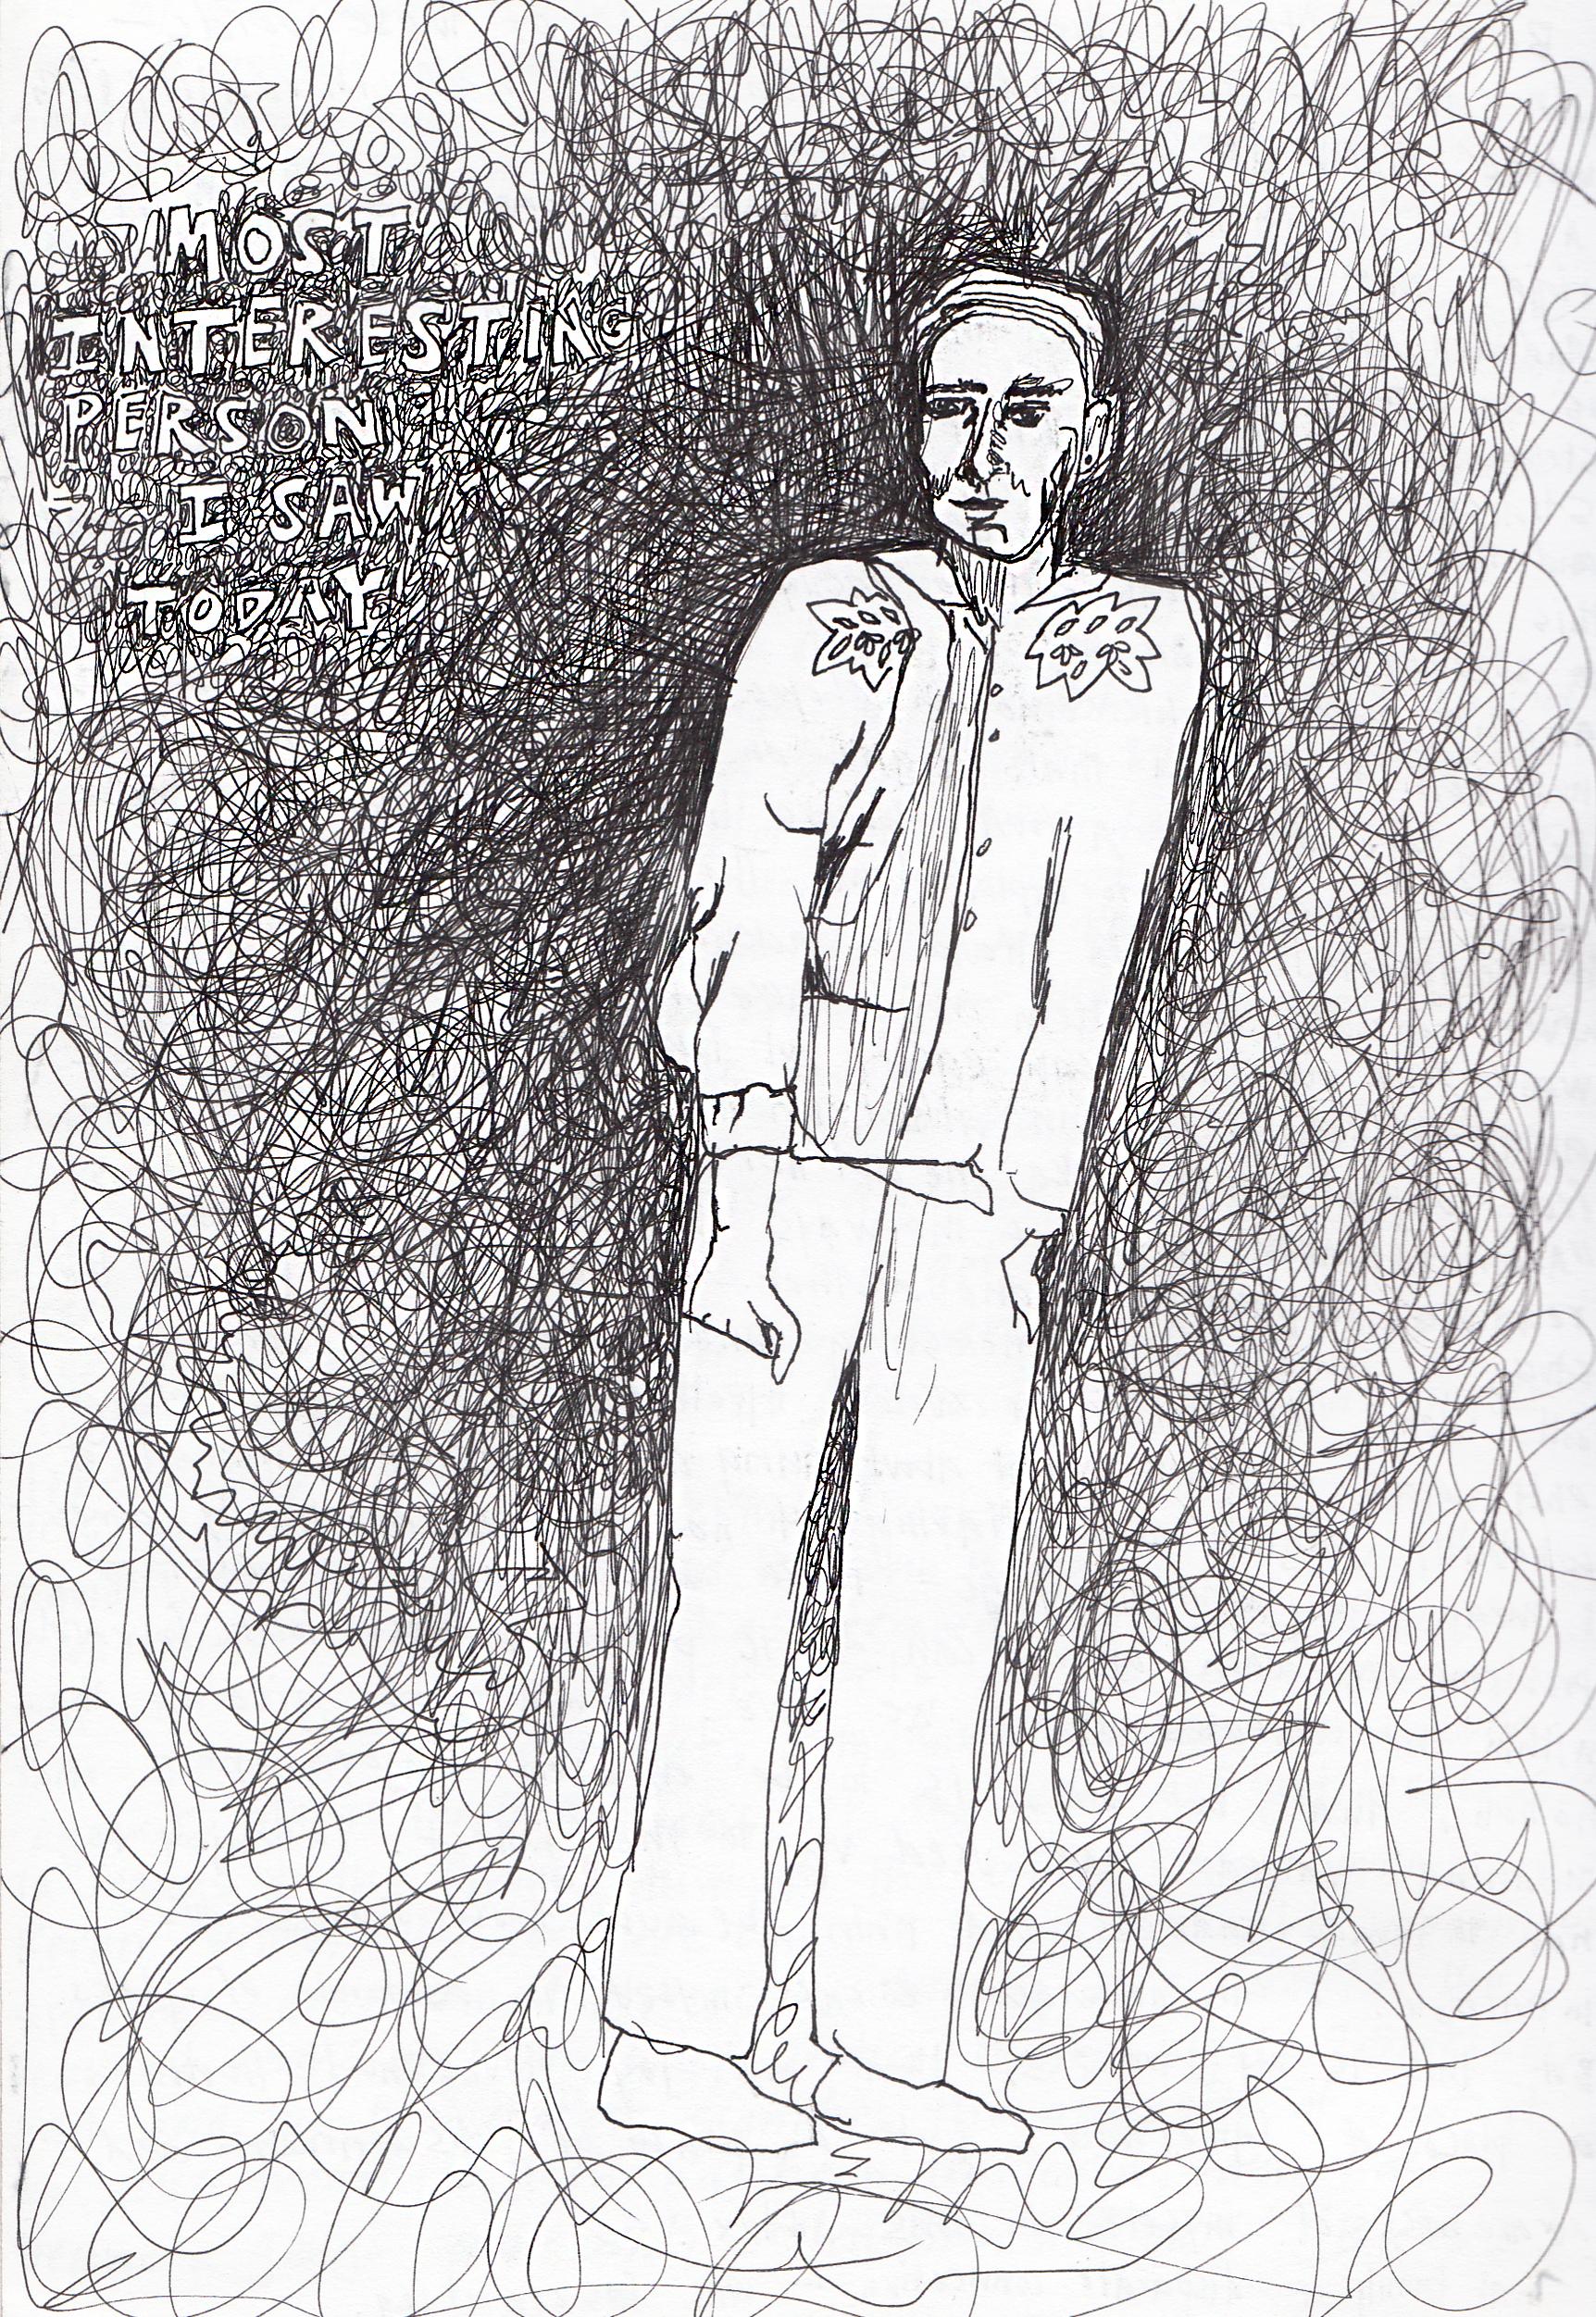 olivia_gilmore_drawing4.jpg